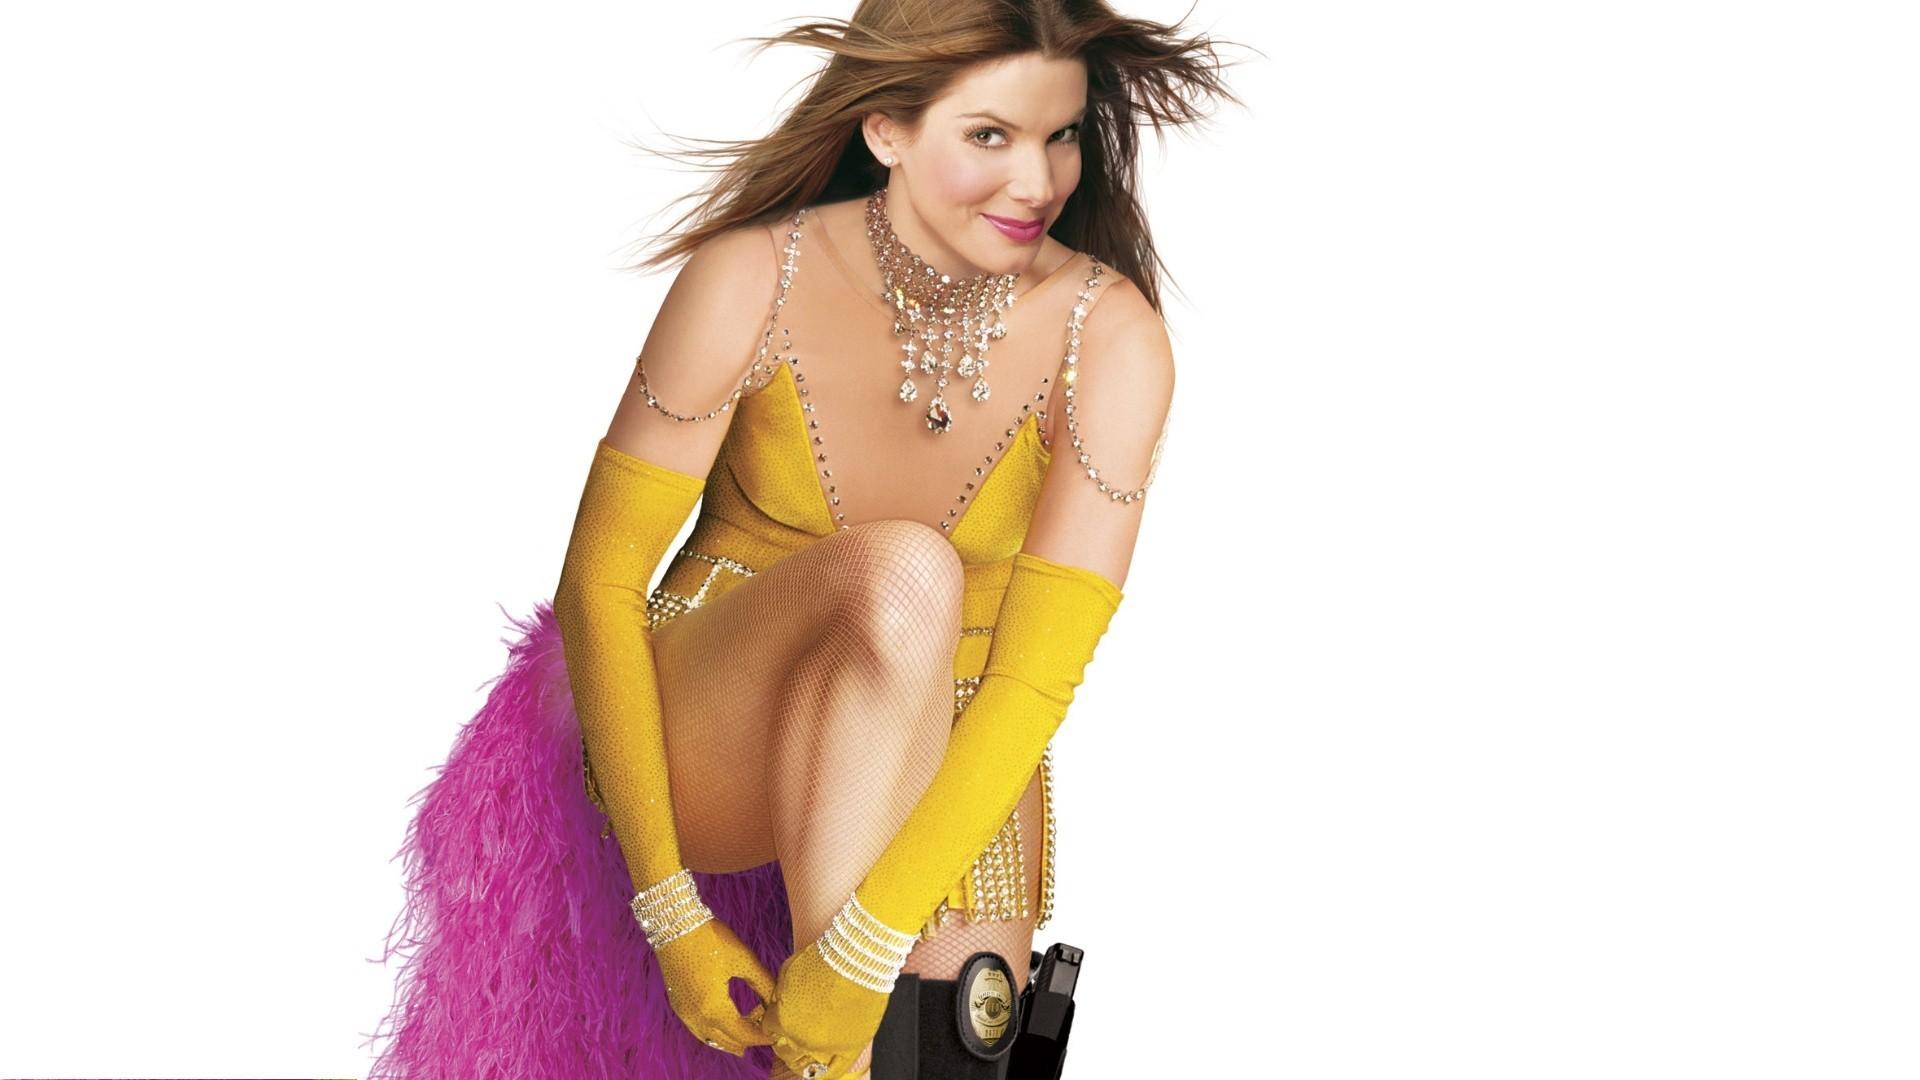 Sandra Bullock Comedy Performance